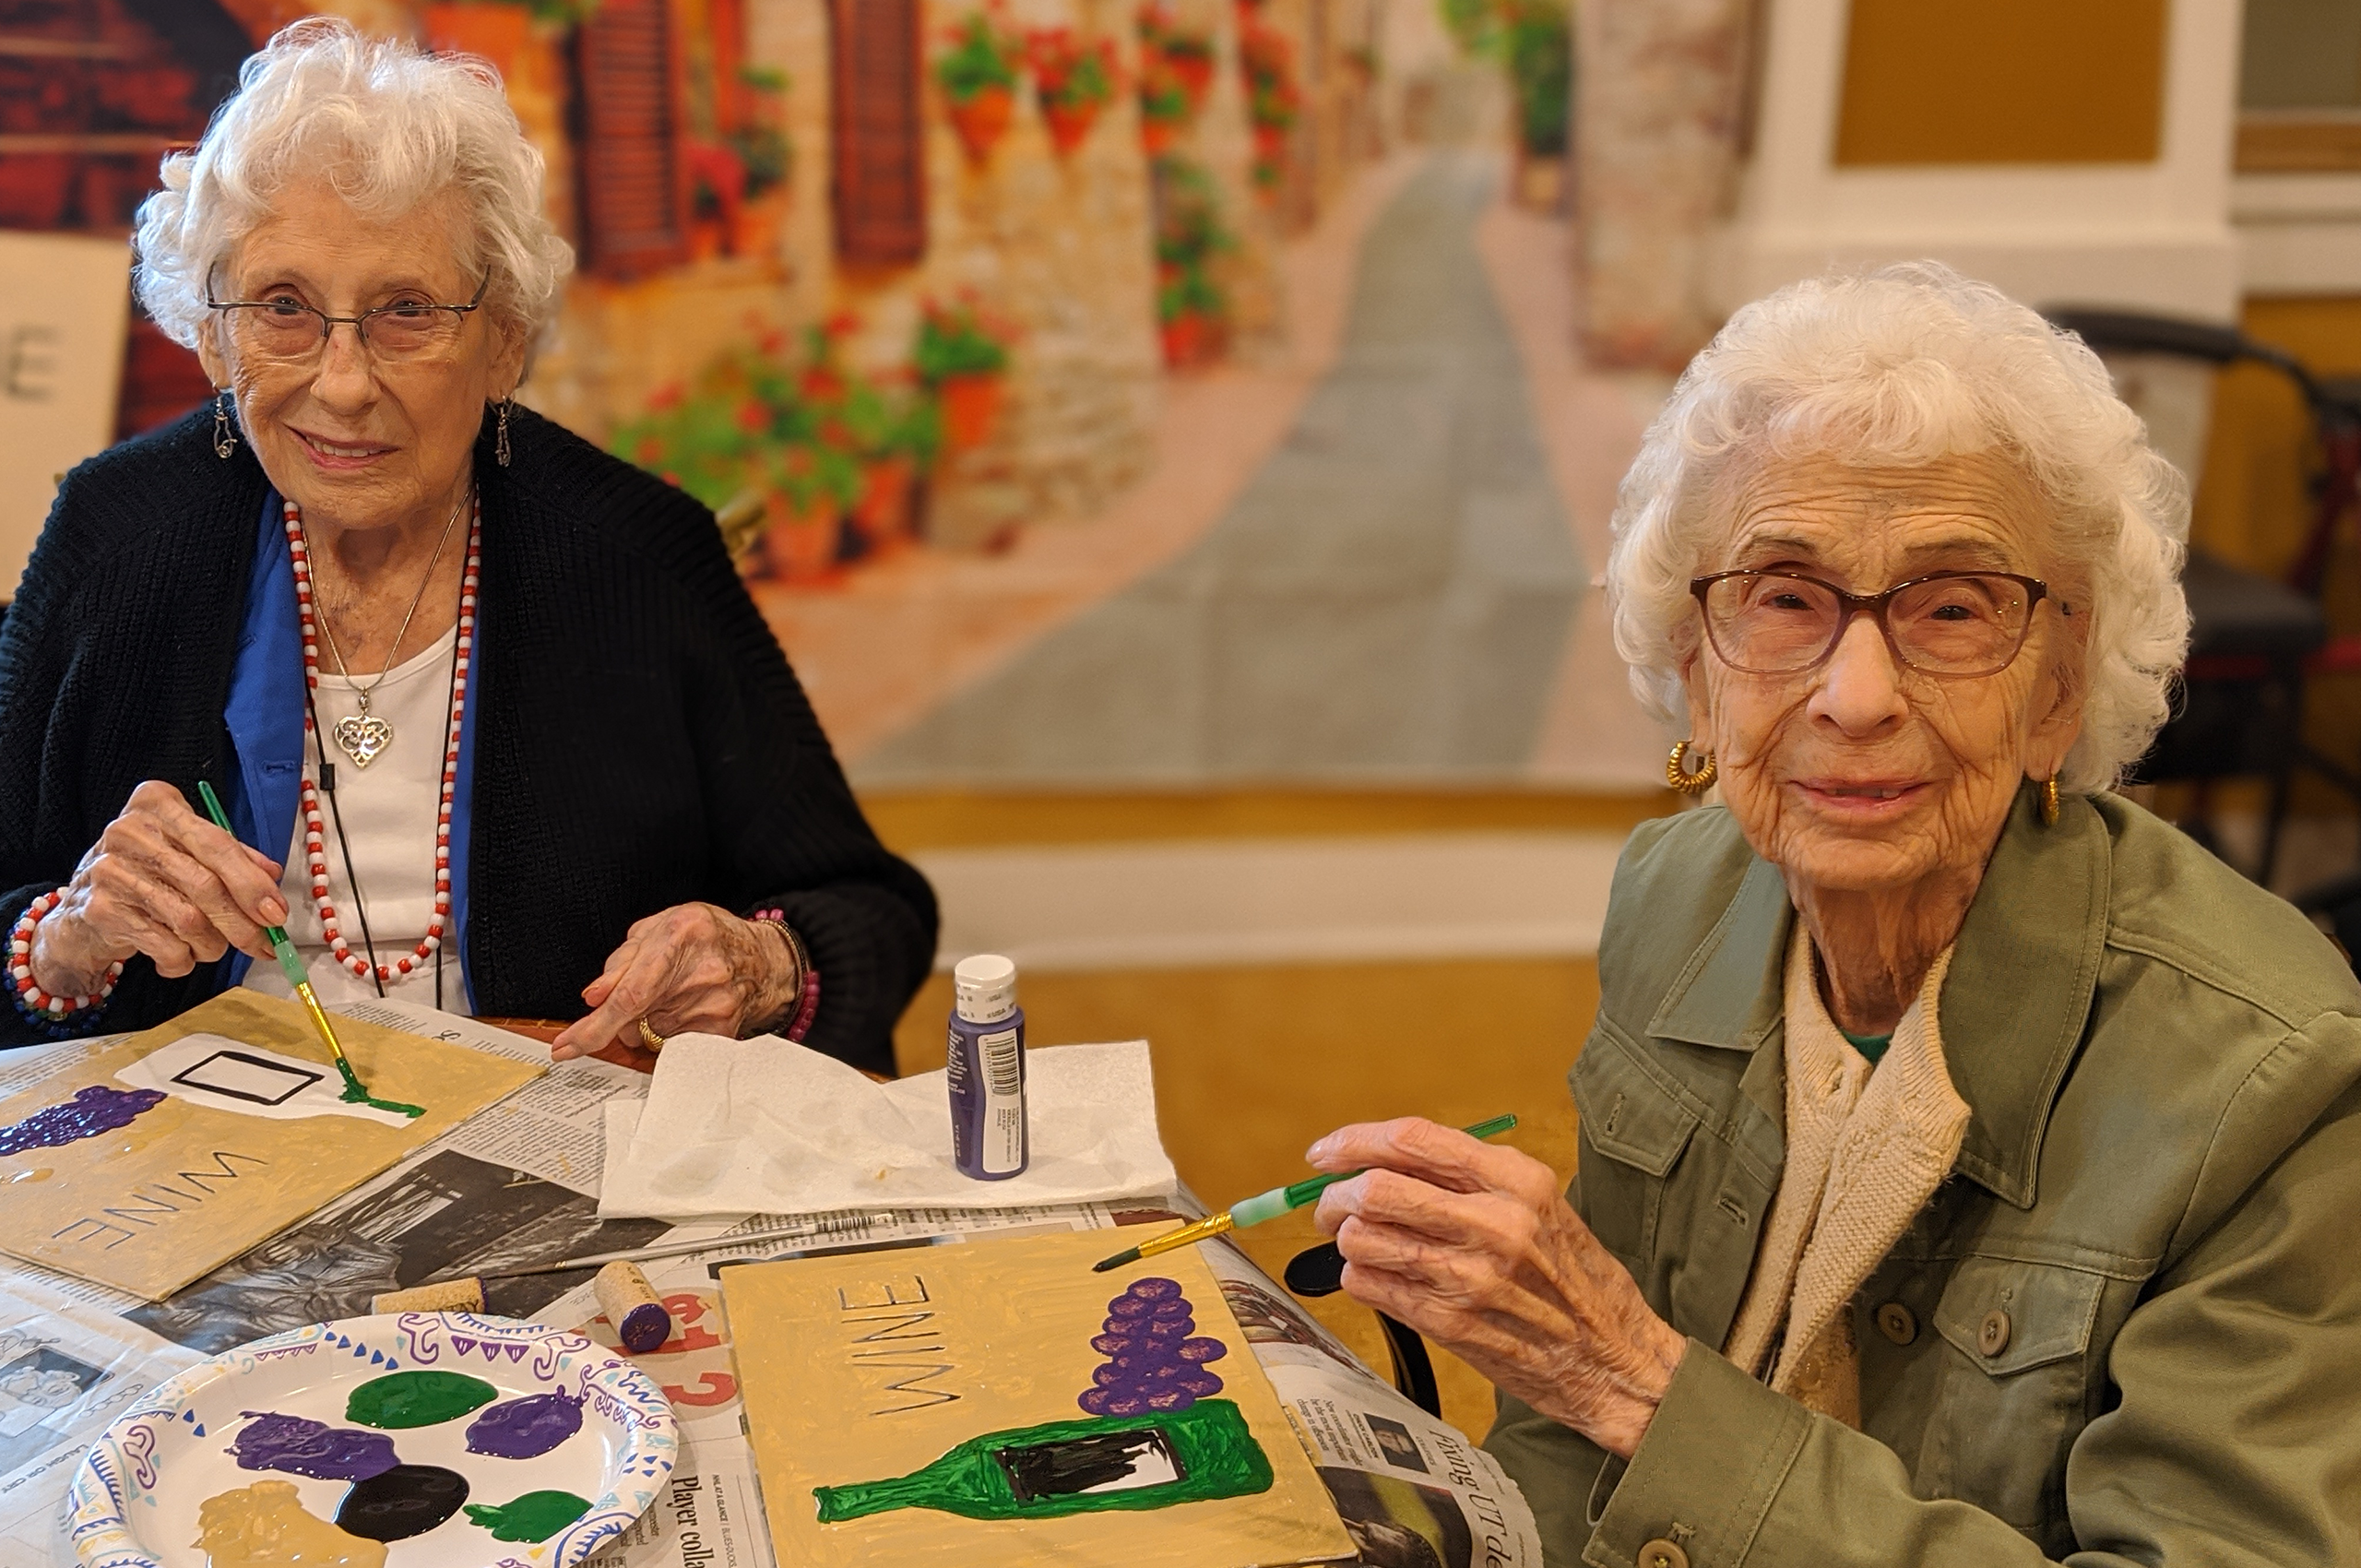 two seniors enjoying crafting